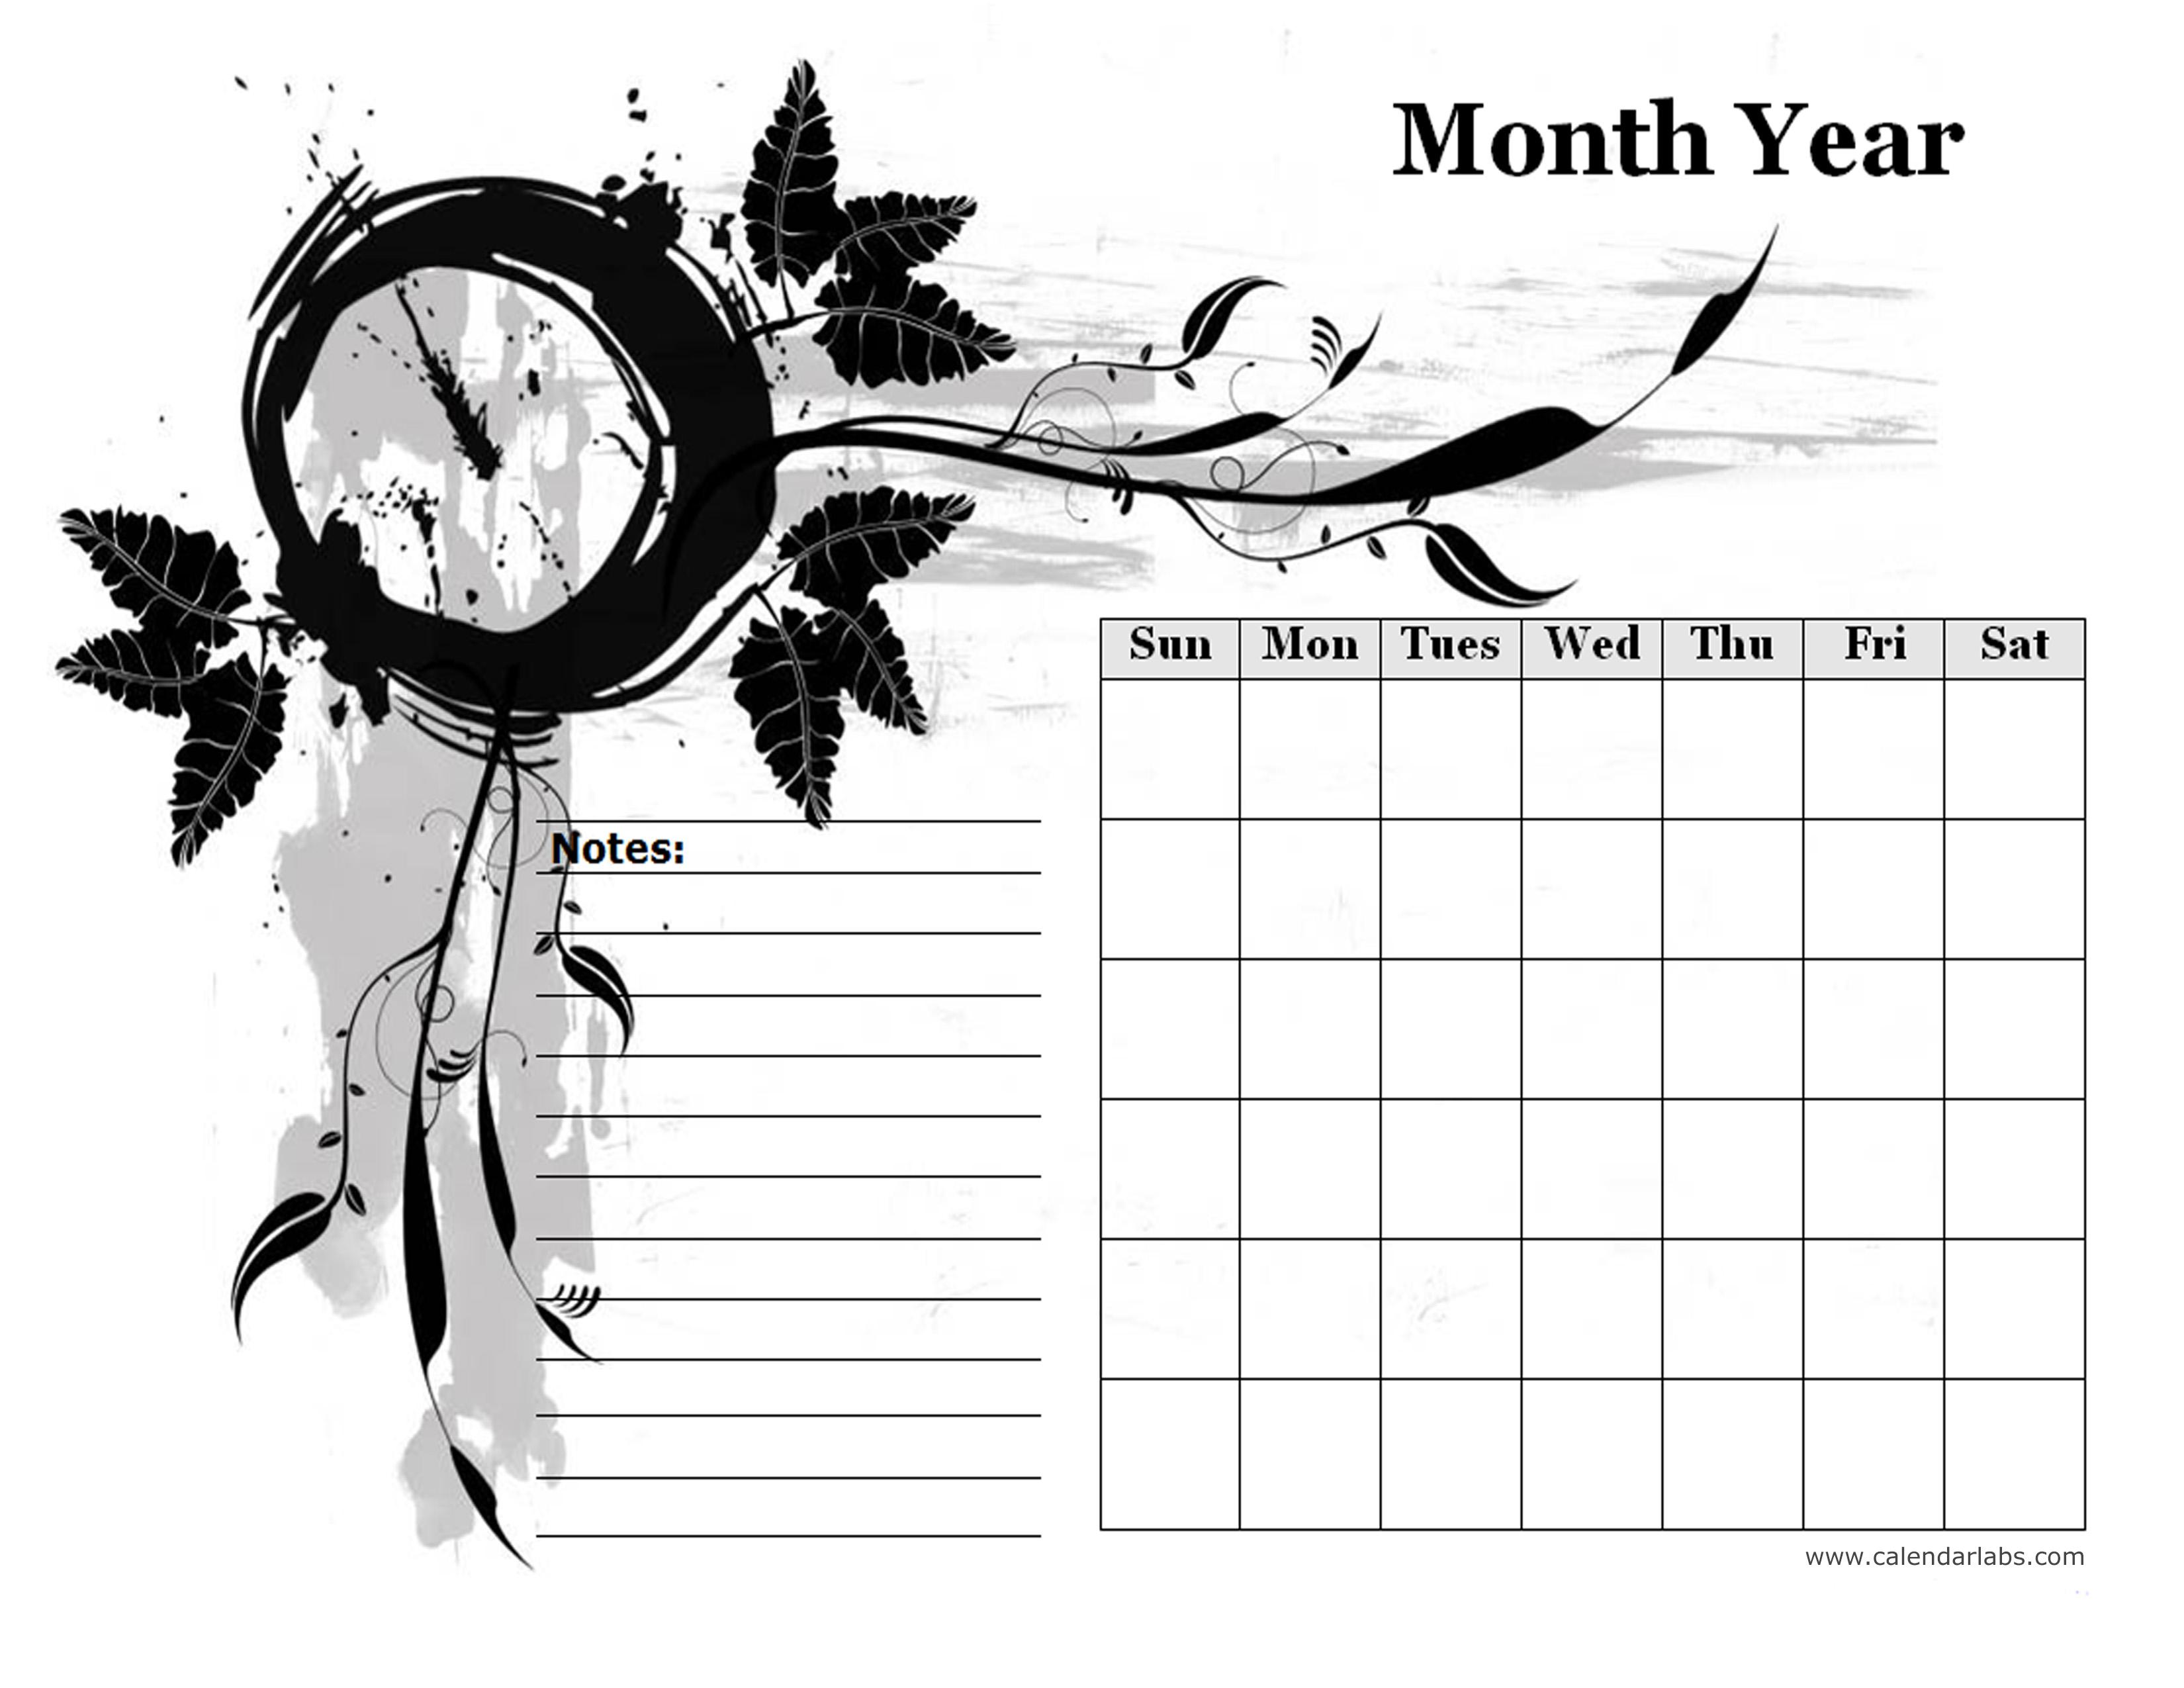 monthly blank calendar in designer monochrome